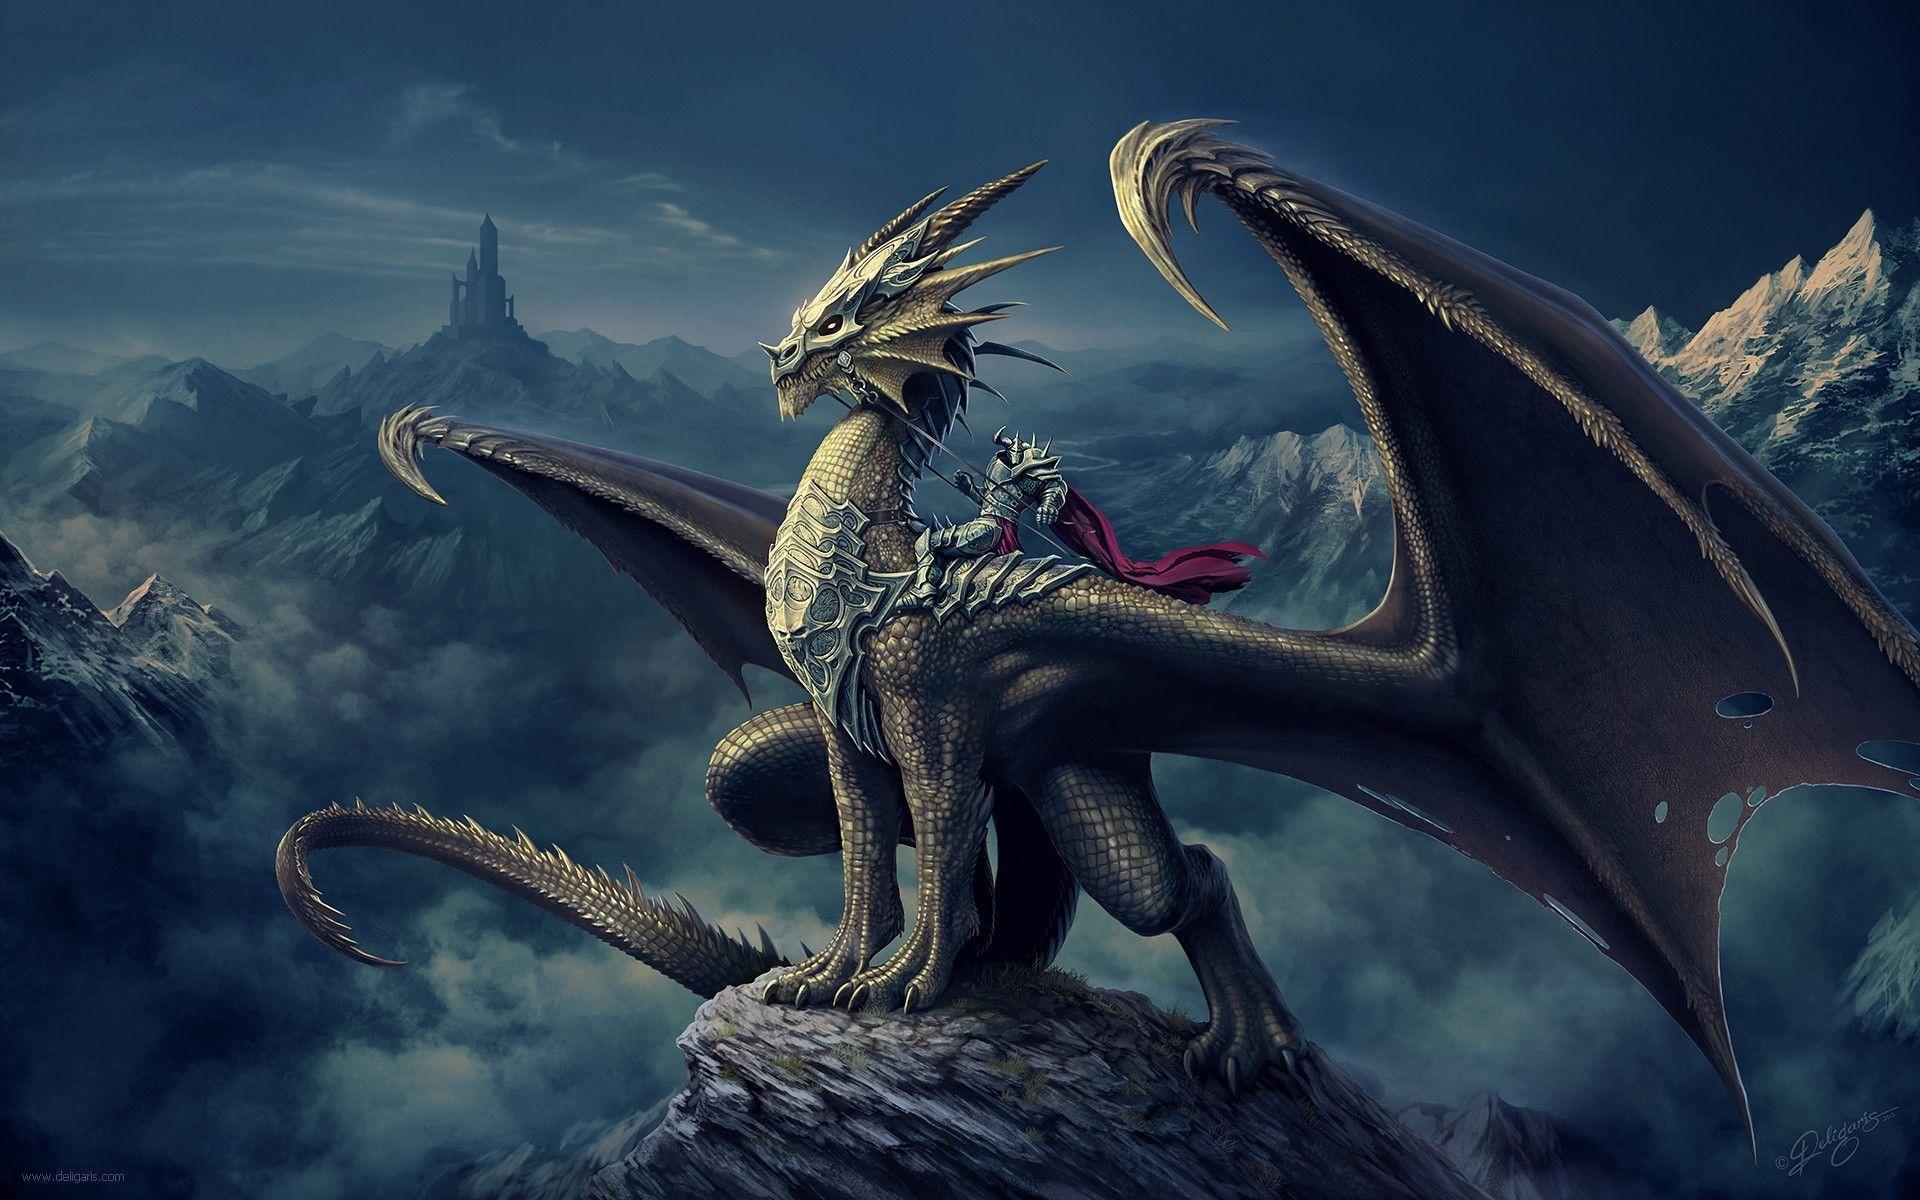 4K Ultra HD Dragon Wallpapers - Top Free 4K Ultra HD Dragon